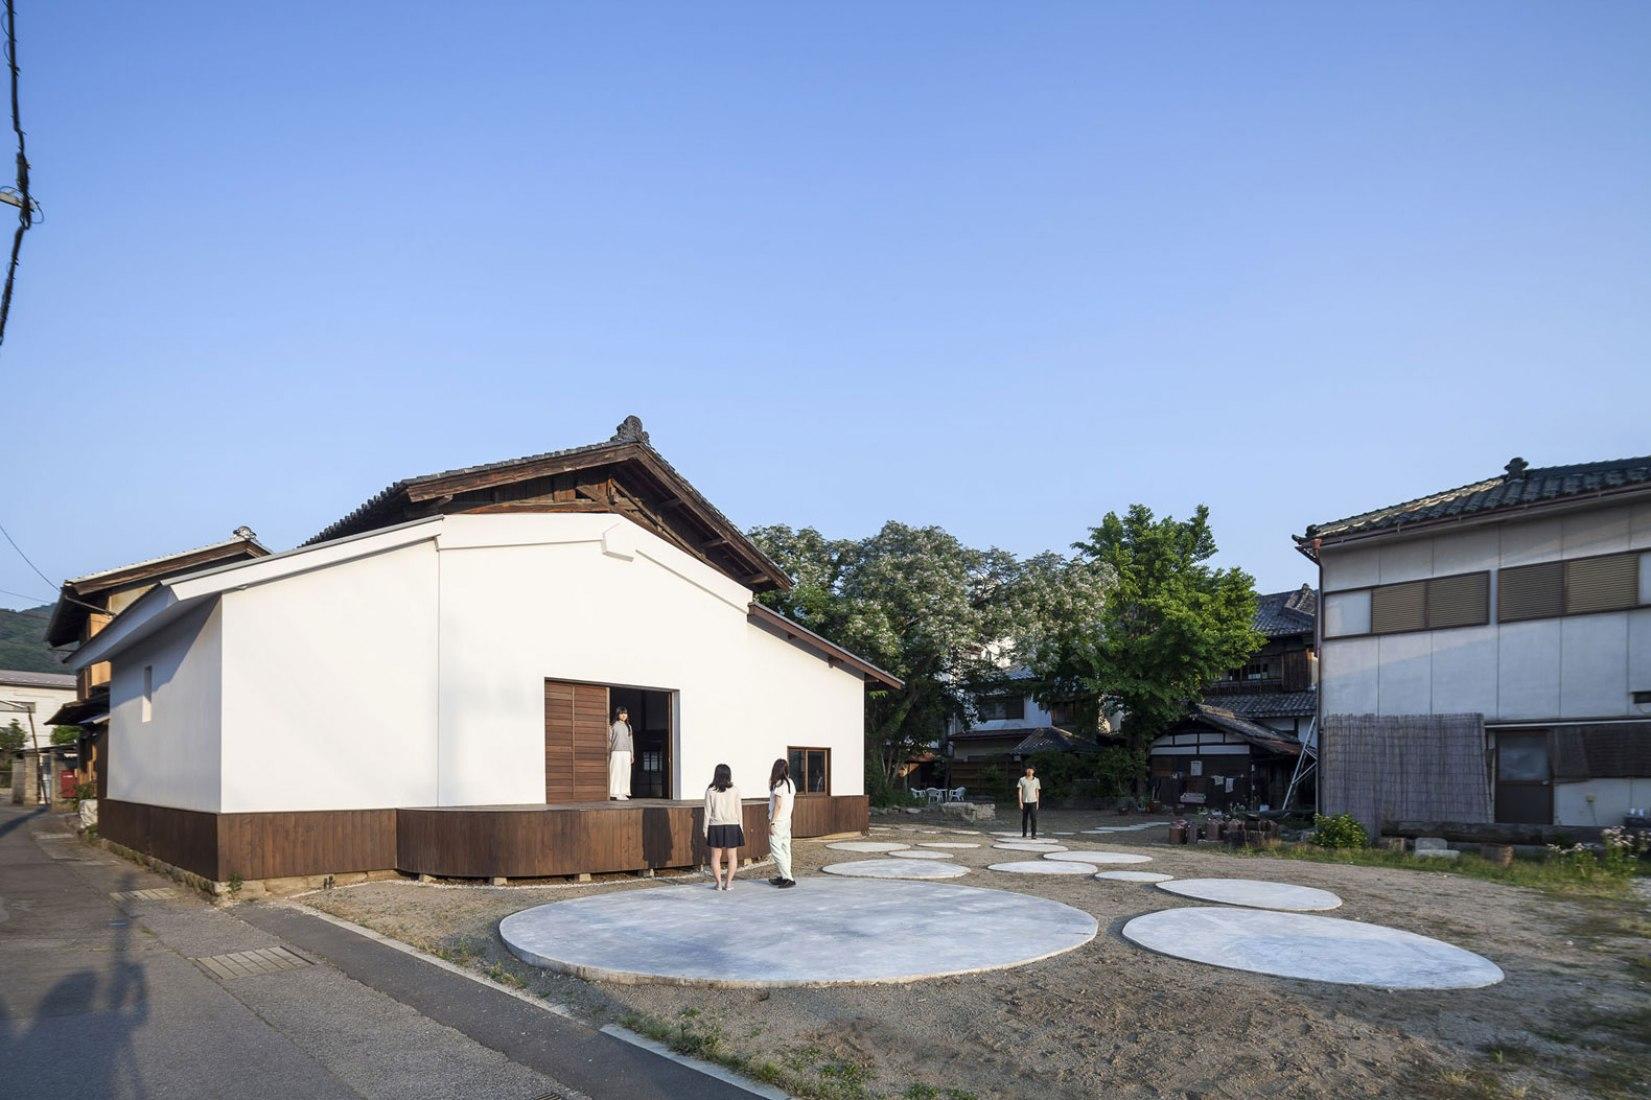 General exterior view. Conversion of a Sake Warehouse by Jorge Almazán & Keio University Almazán Lab. Image © Montse Zamorano.